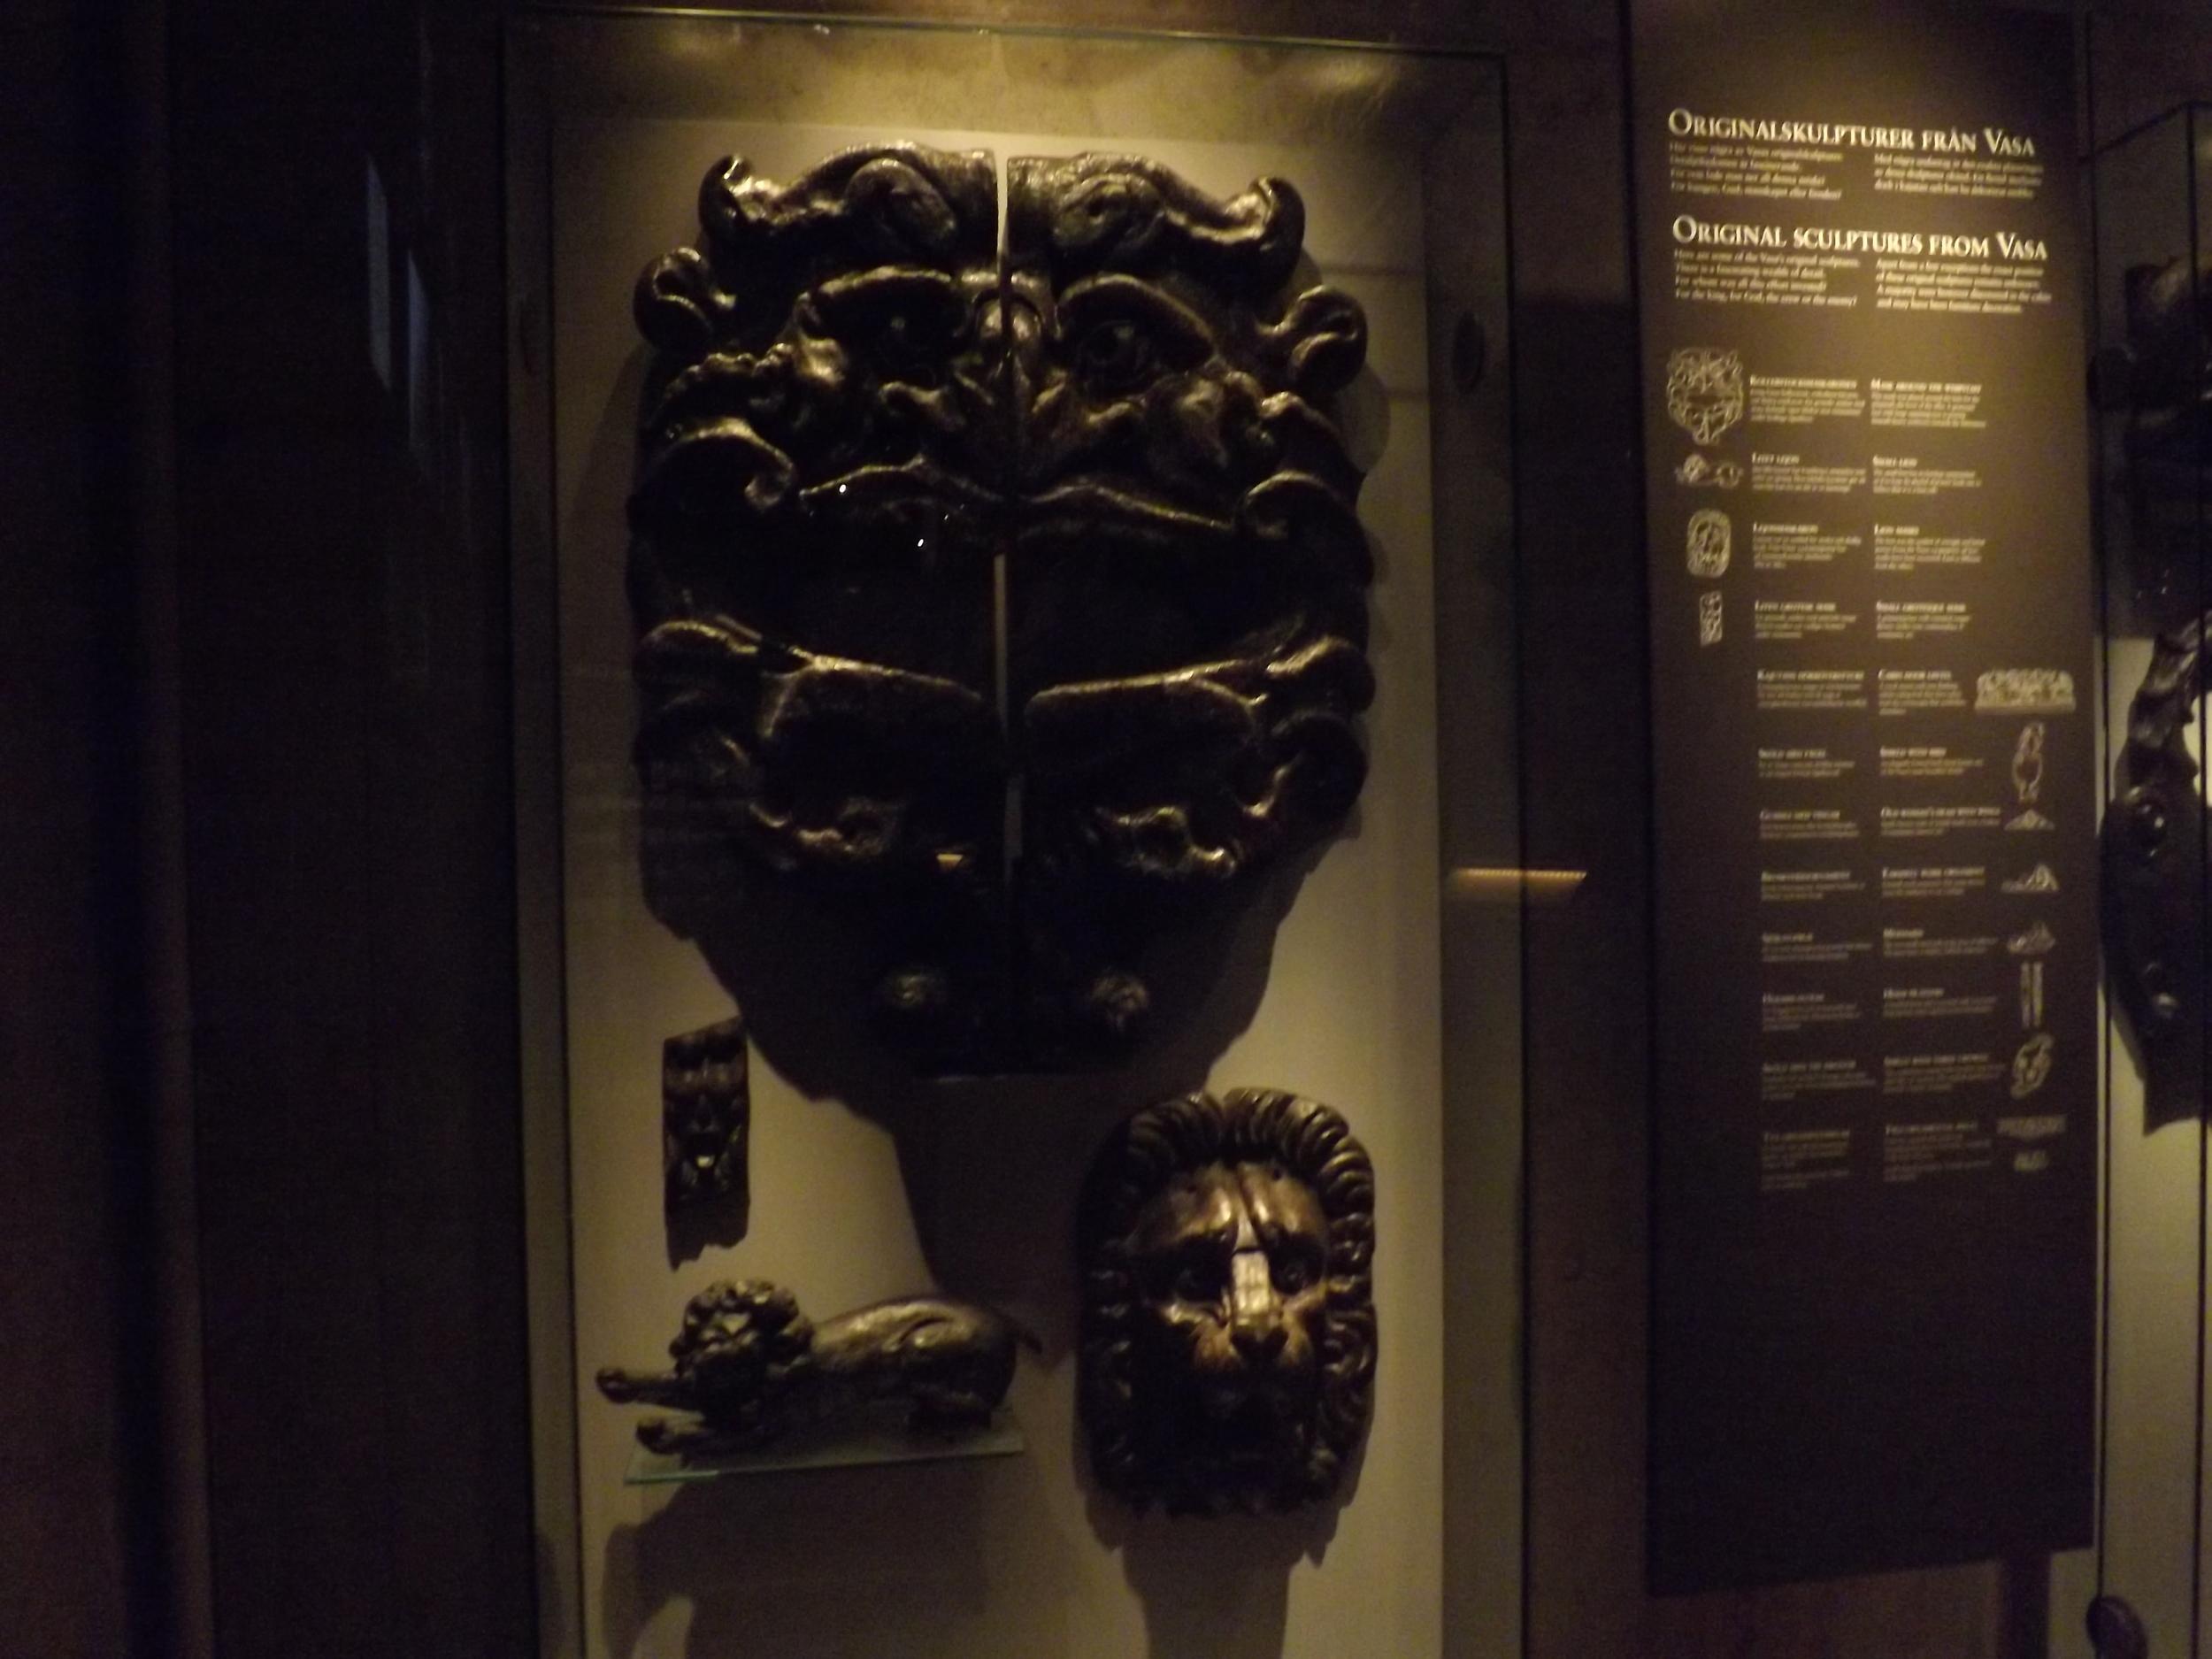 Vasa Artifacts | Tall Girl Meets World